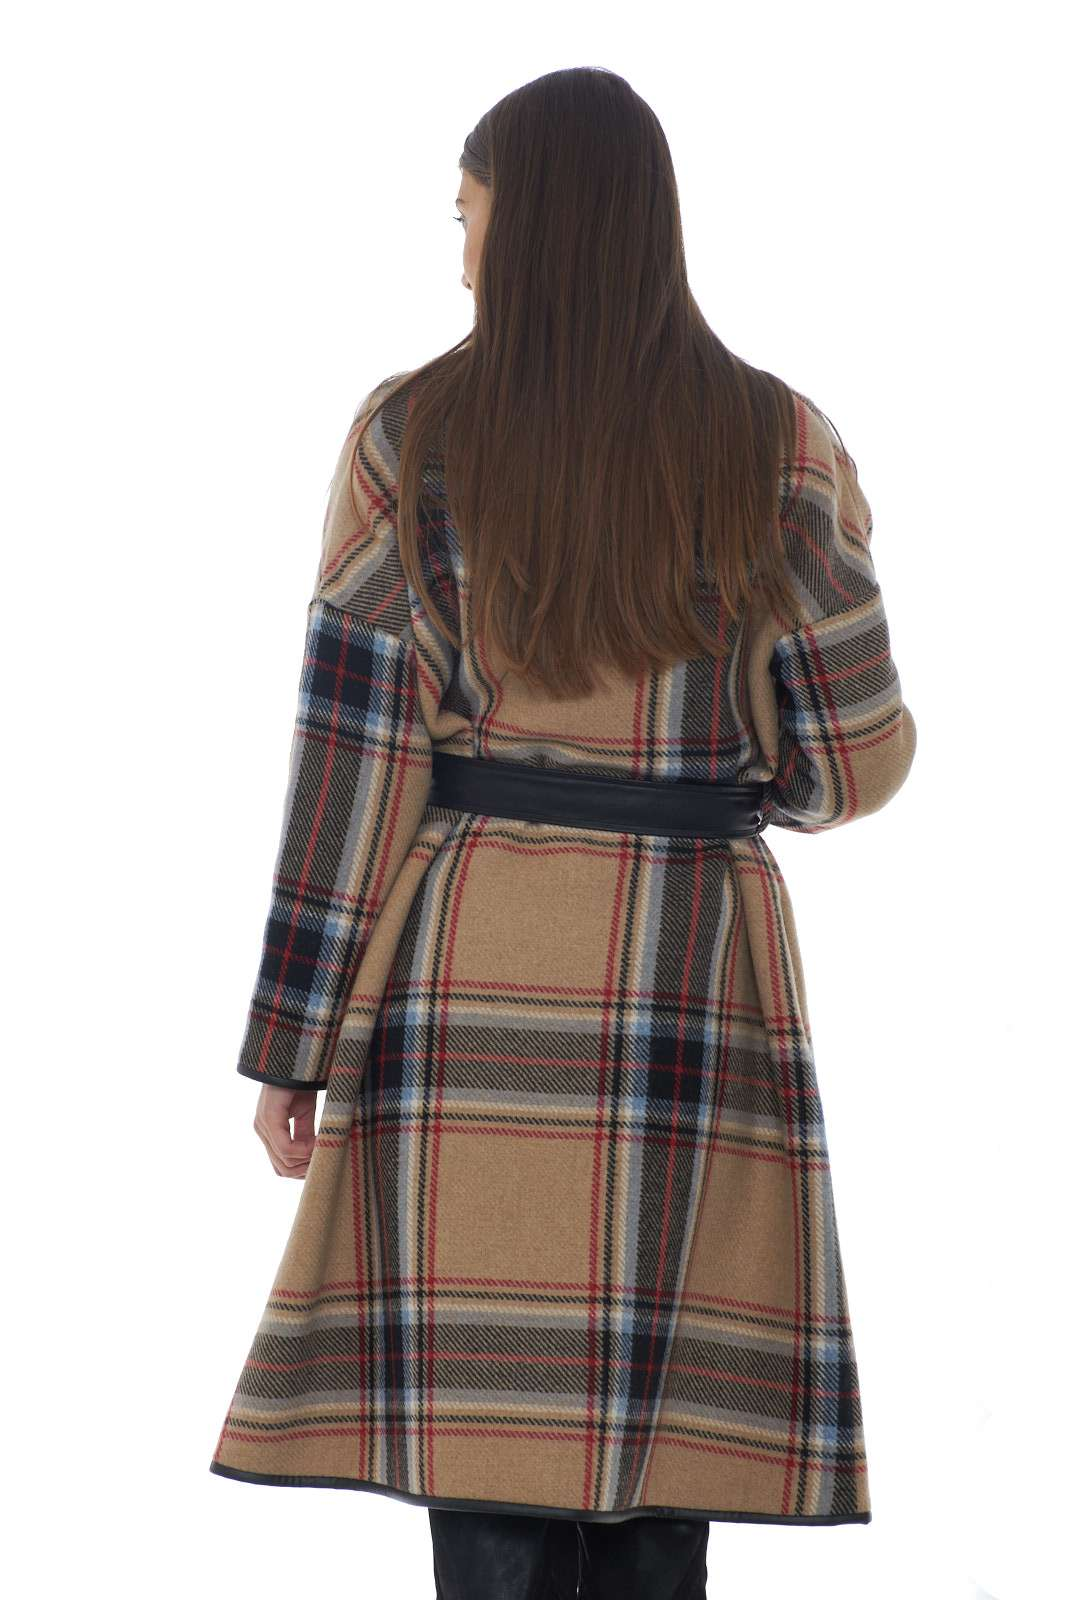 https://www.parmax.com/media/catalog/product/a/i/AI-outlet_parmax-cappotto-donna.Pinko-1G14HX-C.jpg